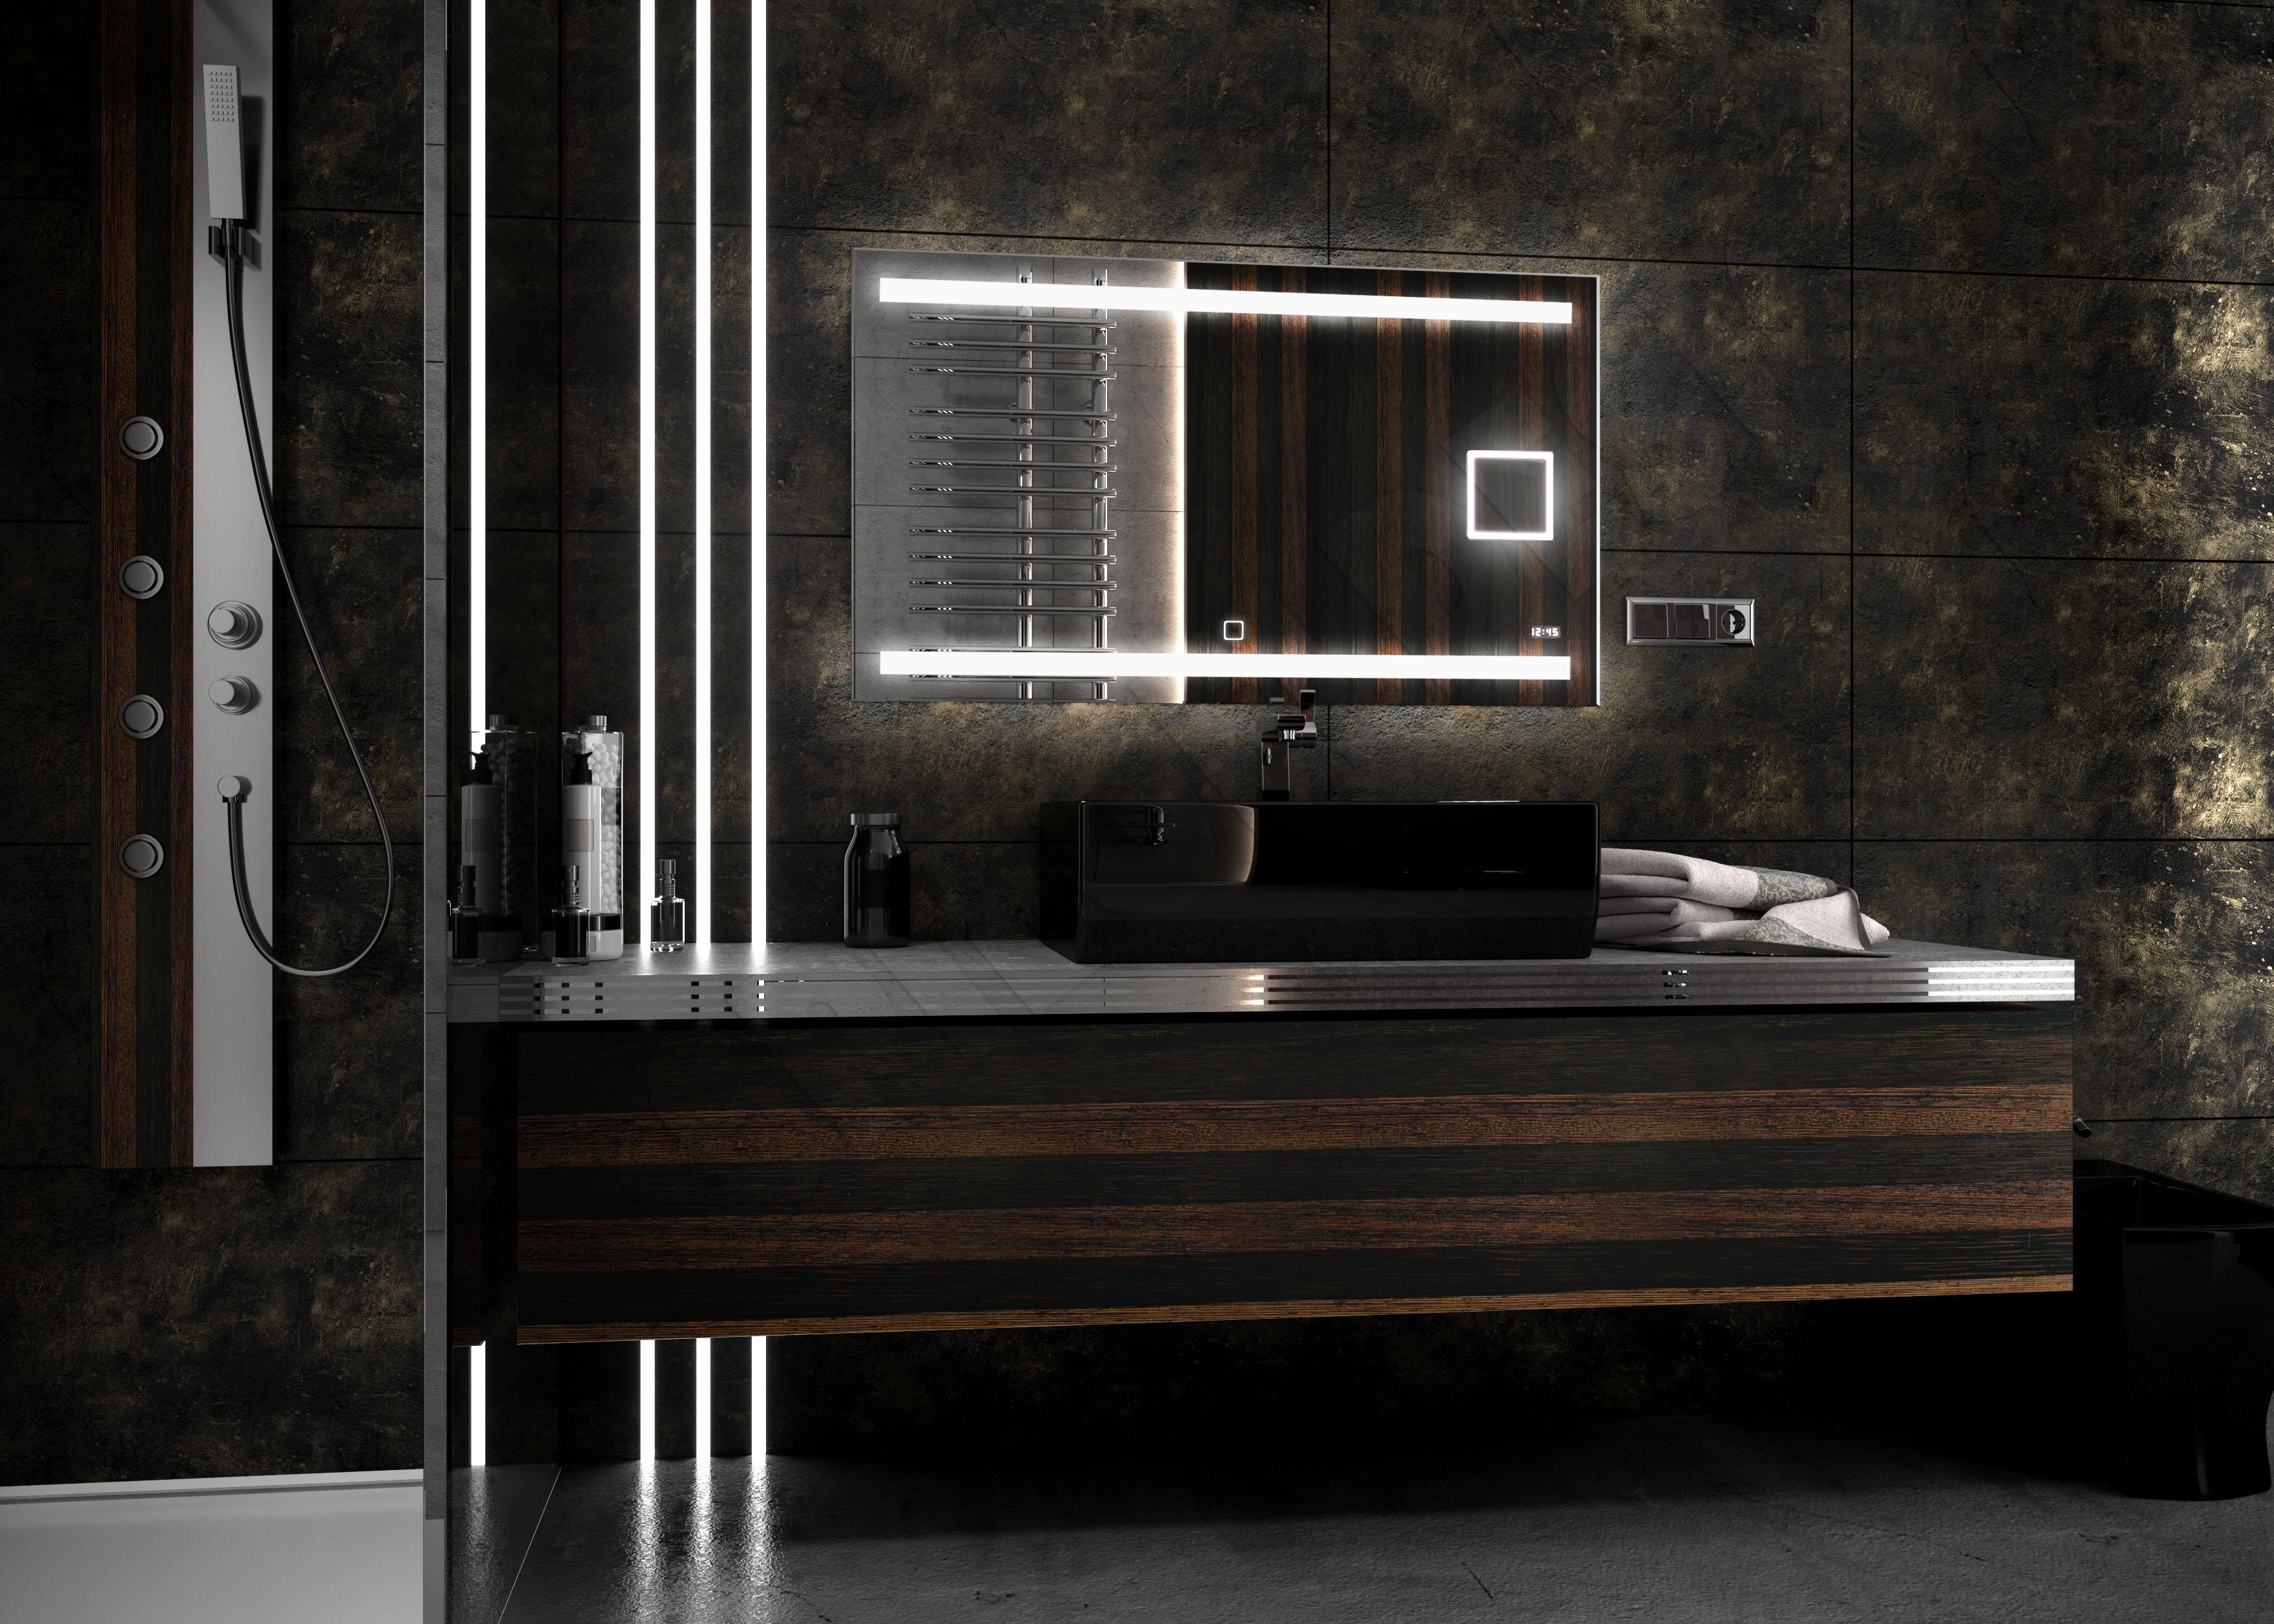 39 revoled 39 kosmetikspiegel uhr neu design led spiegel mit leduhr badspiegel ebay. Black Bedroom Furniture Sets. Home Design Ideas